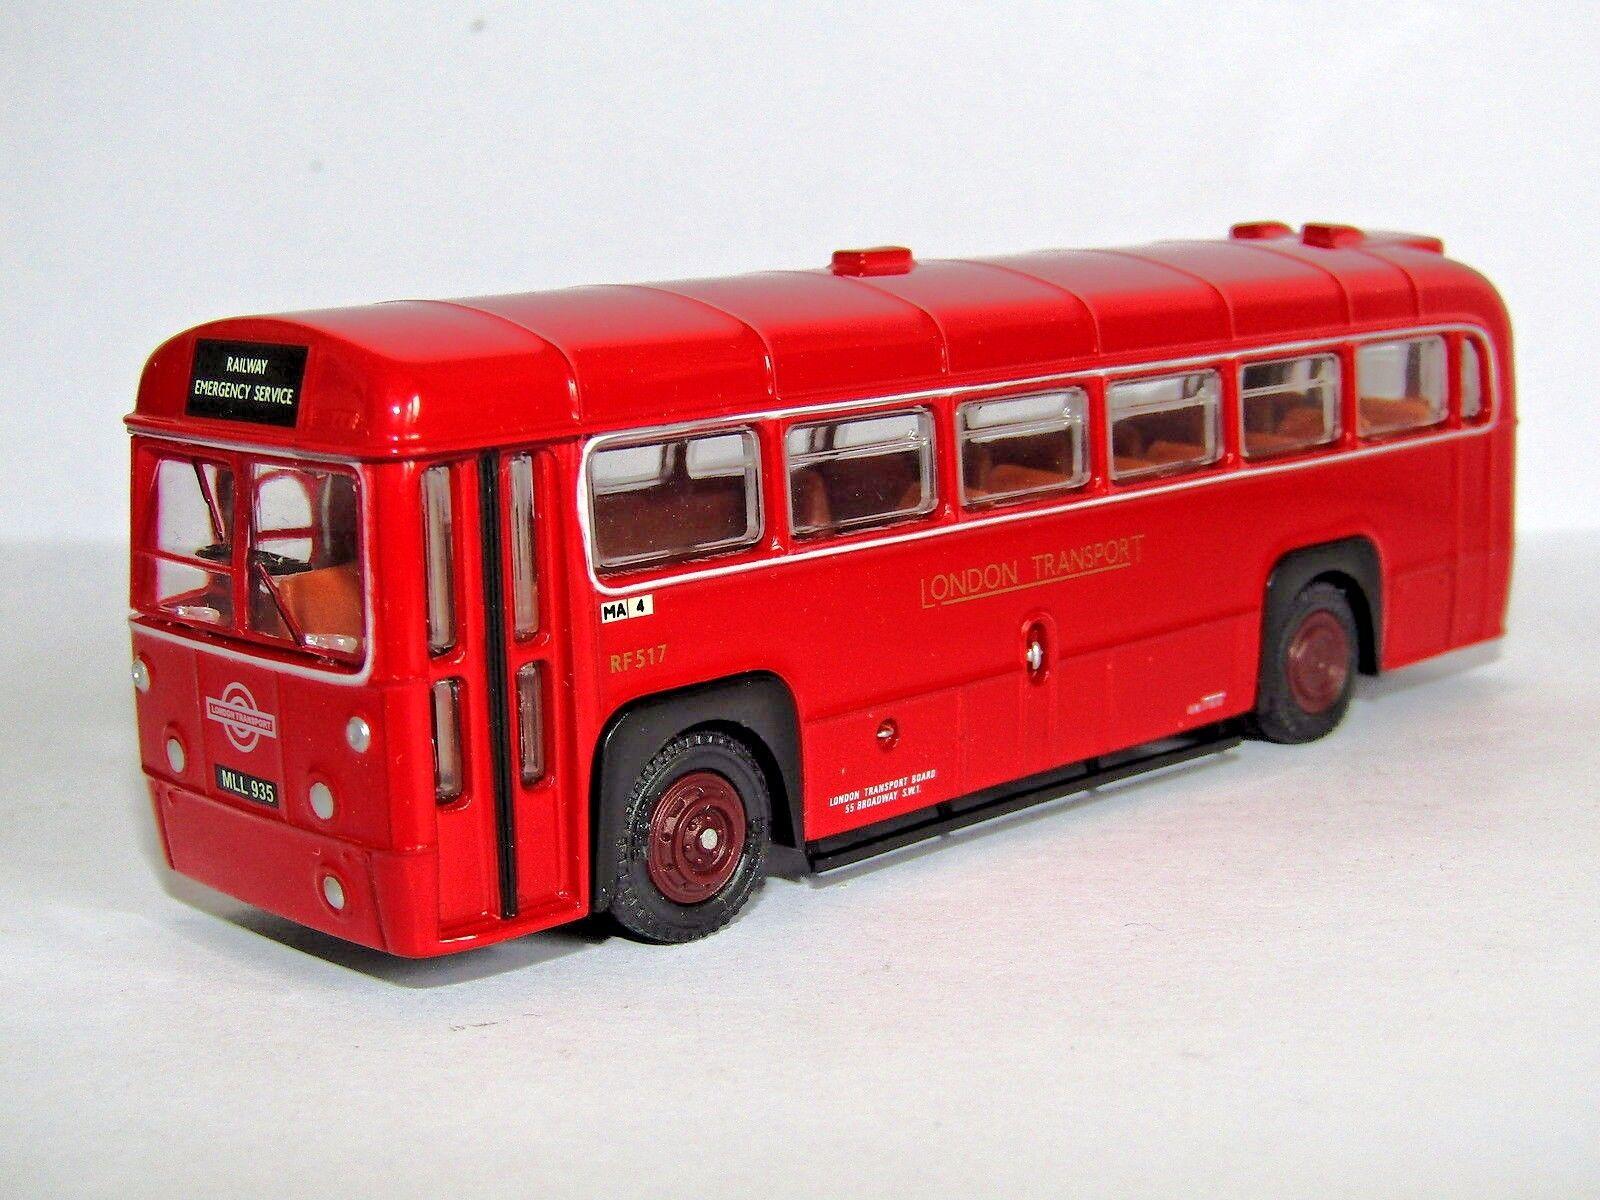 EFE AEC RF BUS LONDON TRANSPORT TRANSPORT TRANSPORT RAILWAY EMERGENCY SERVICE 1 76 WR02 LBRT CODE 3 4cf1dc